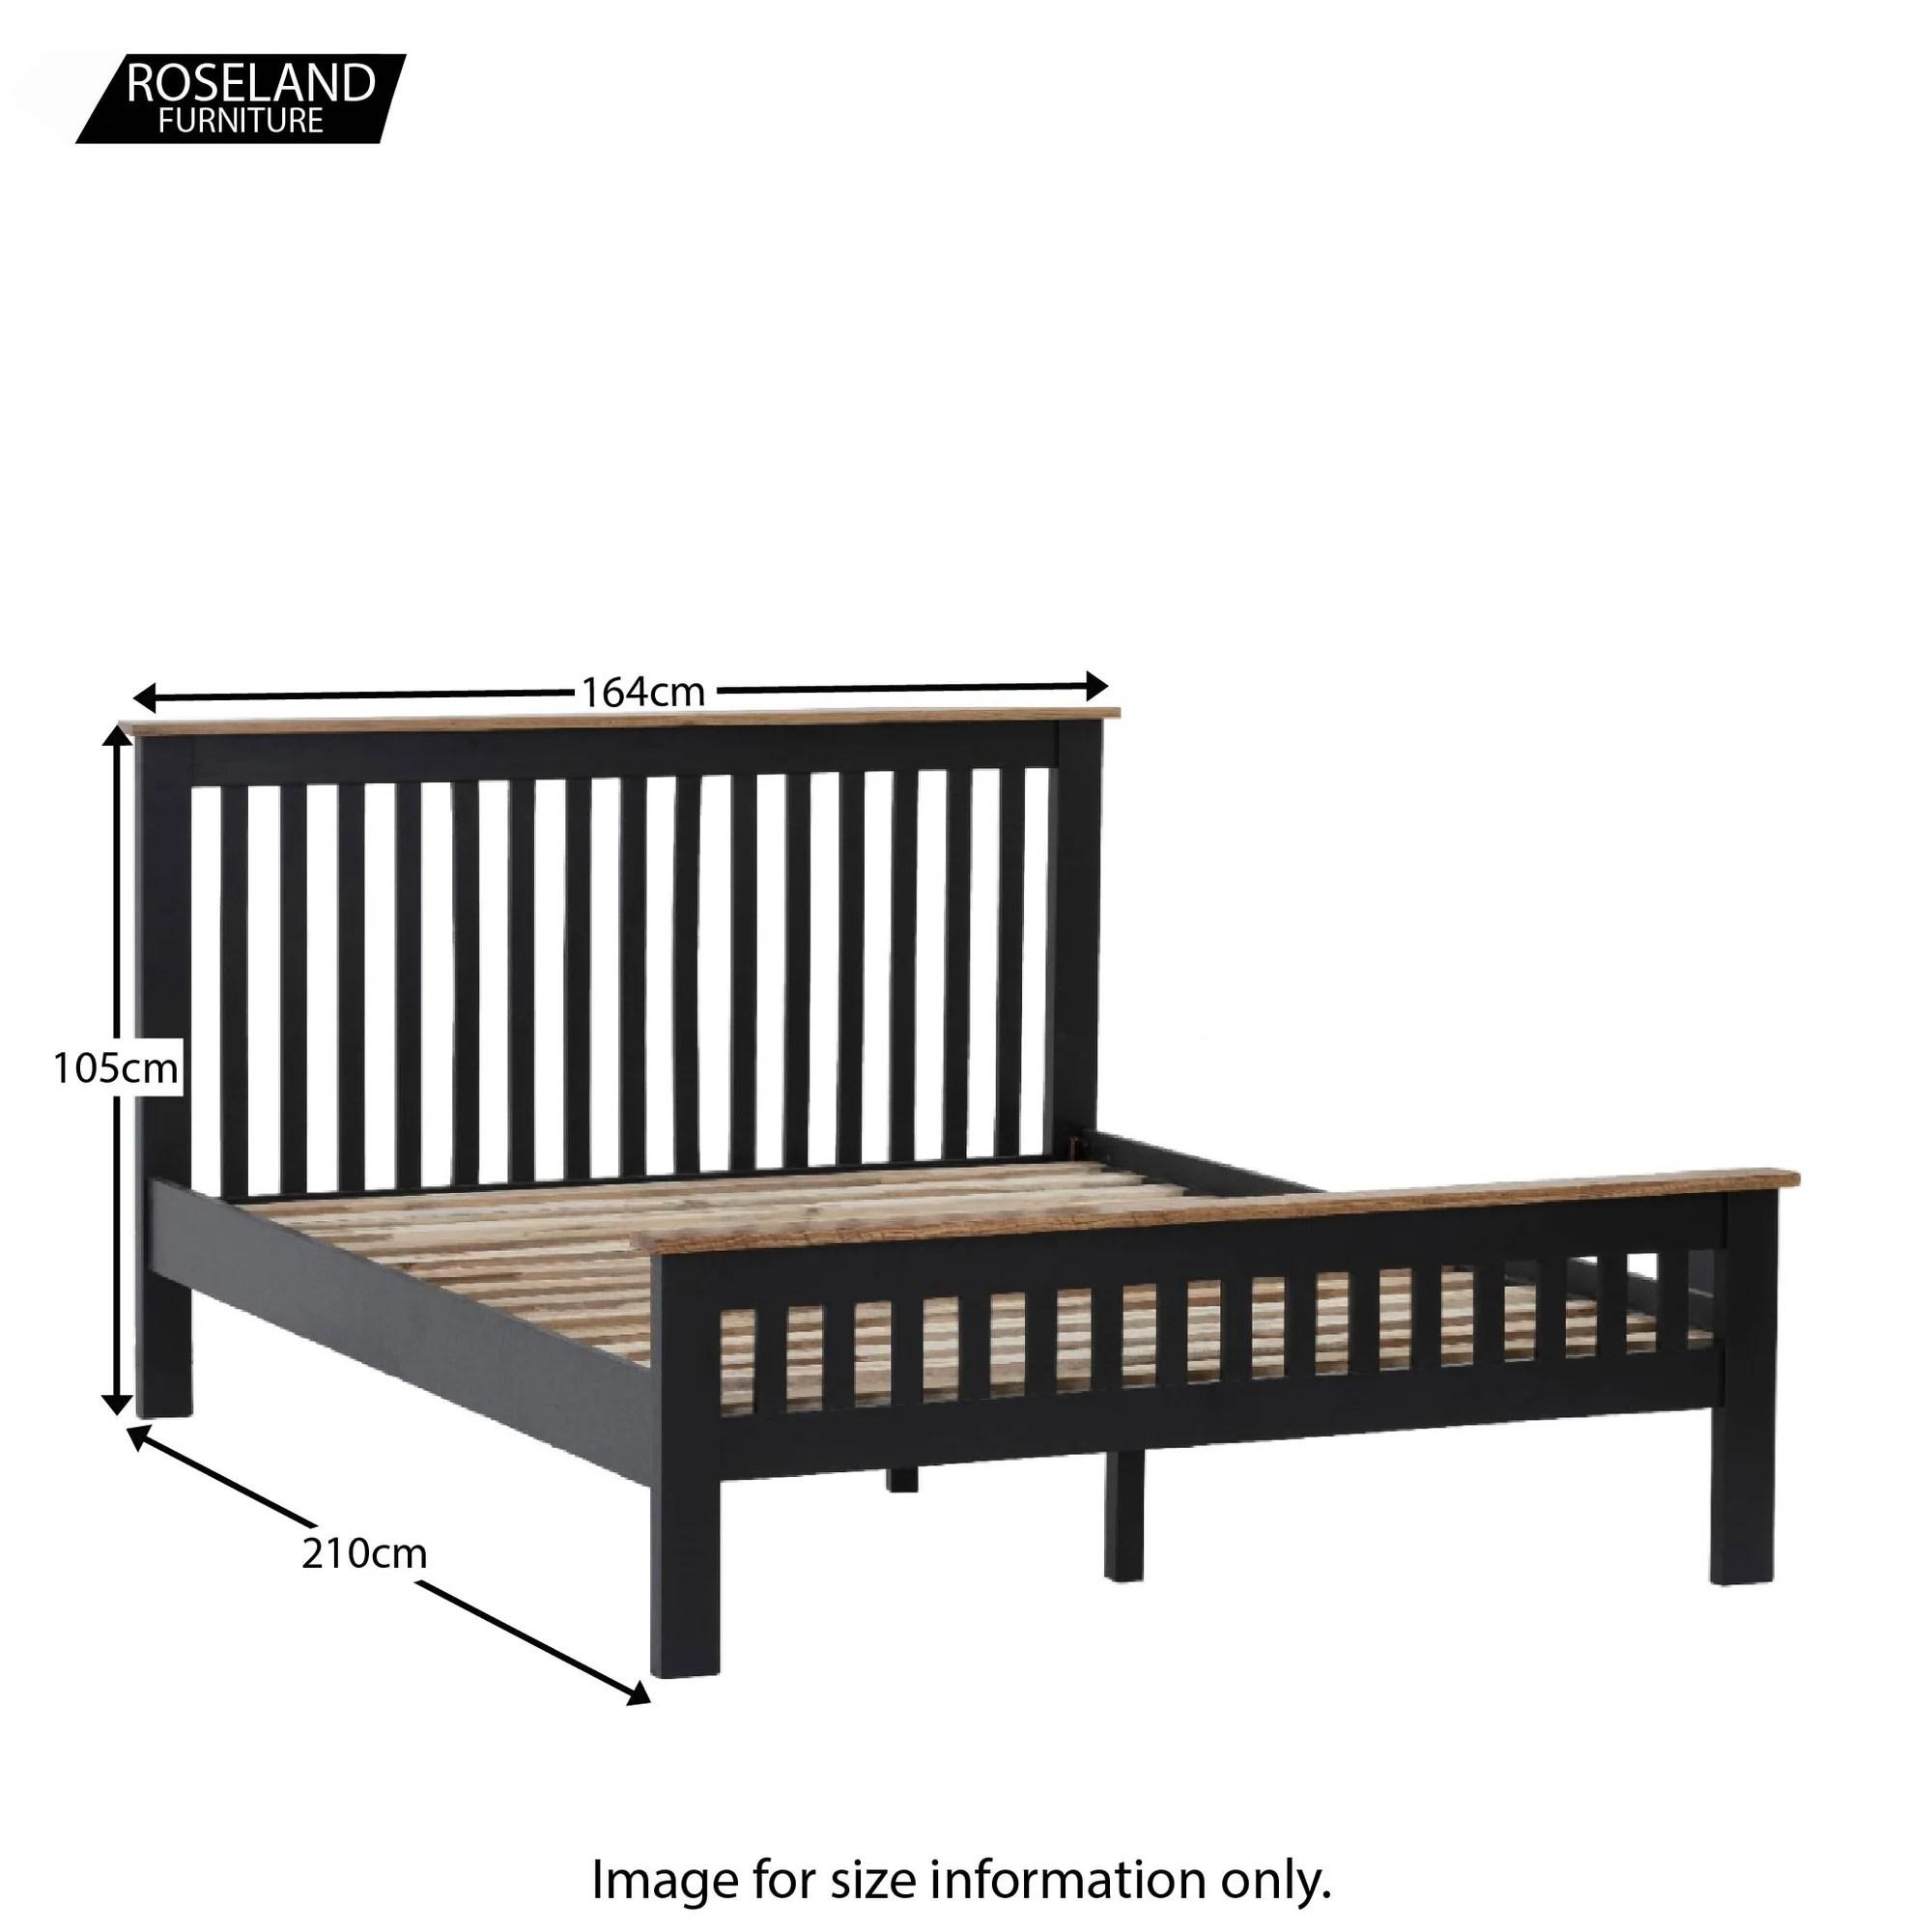 Charlestown Black 5 King Size Bed Frame Roseland Furniture